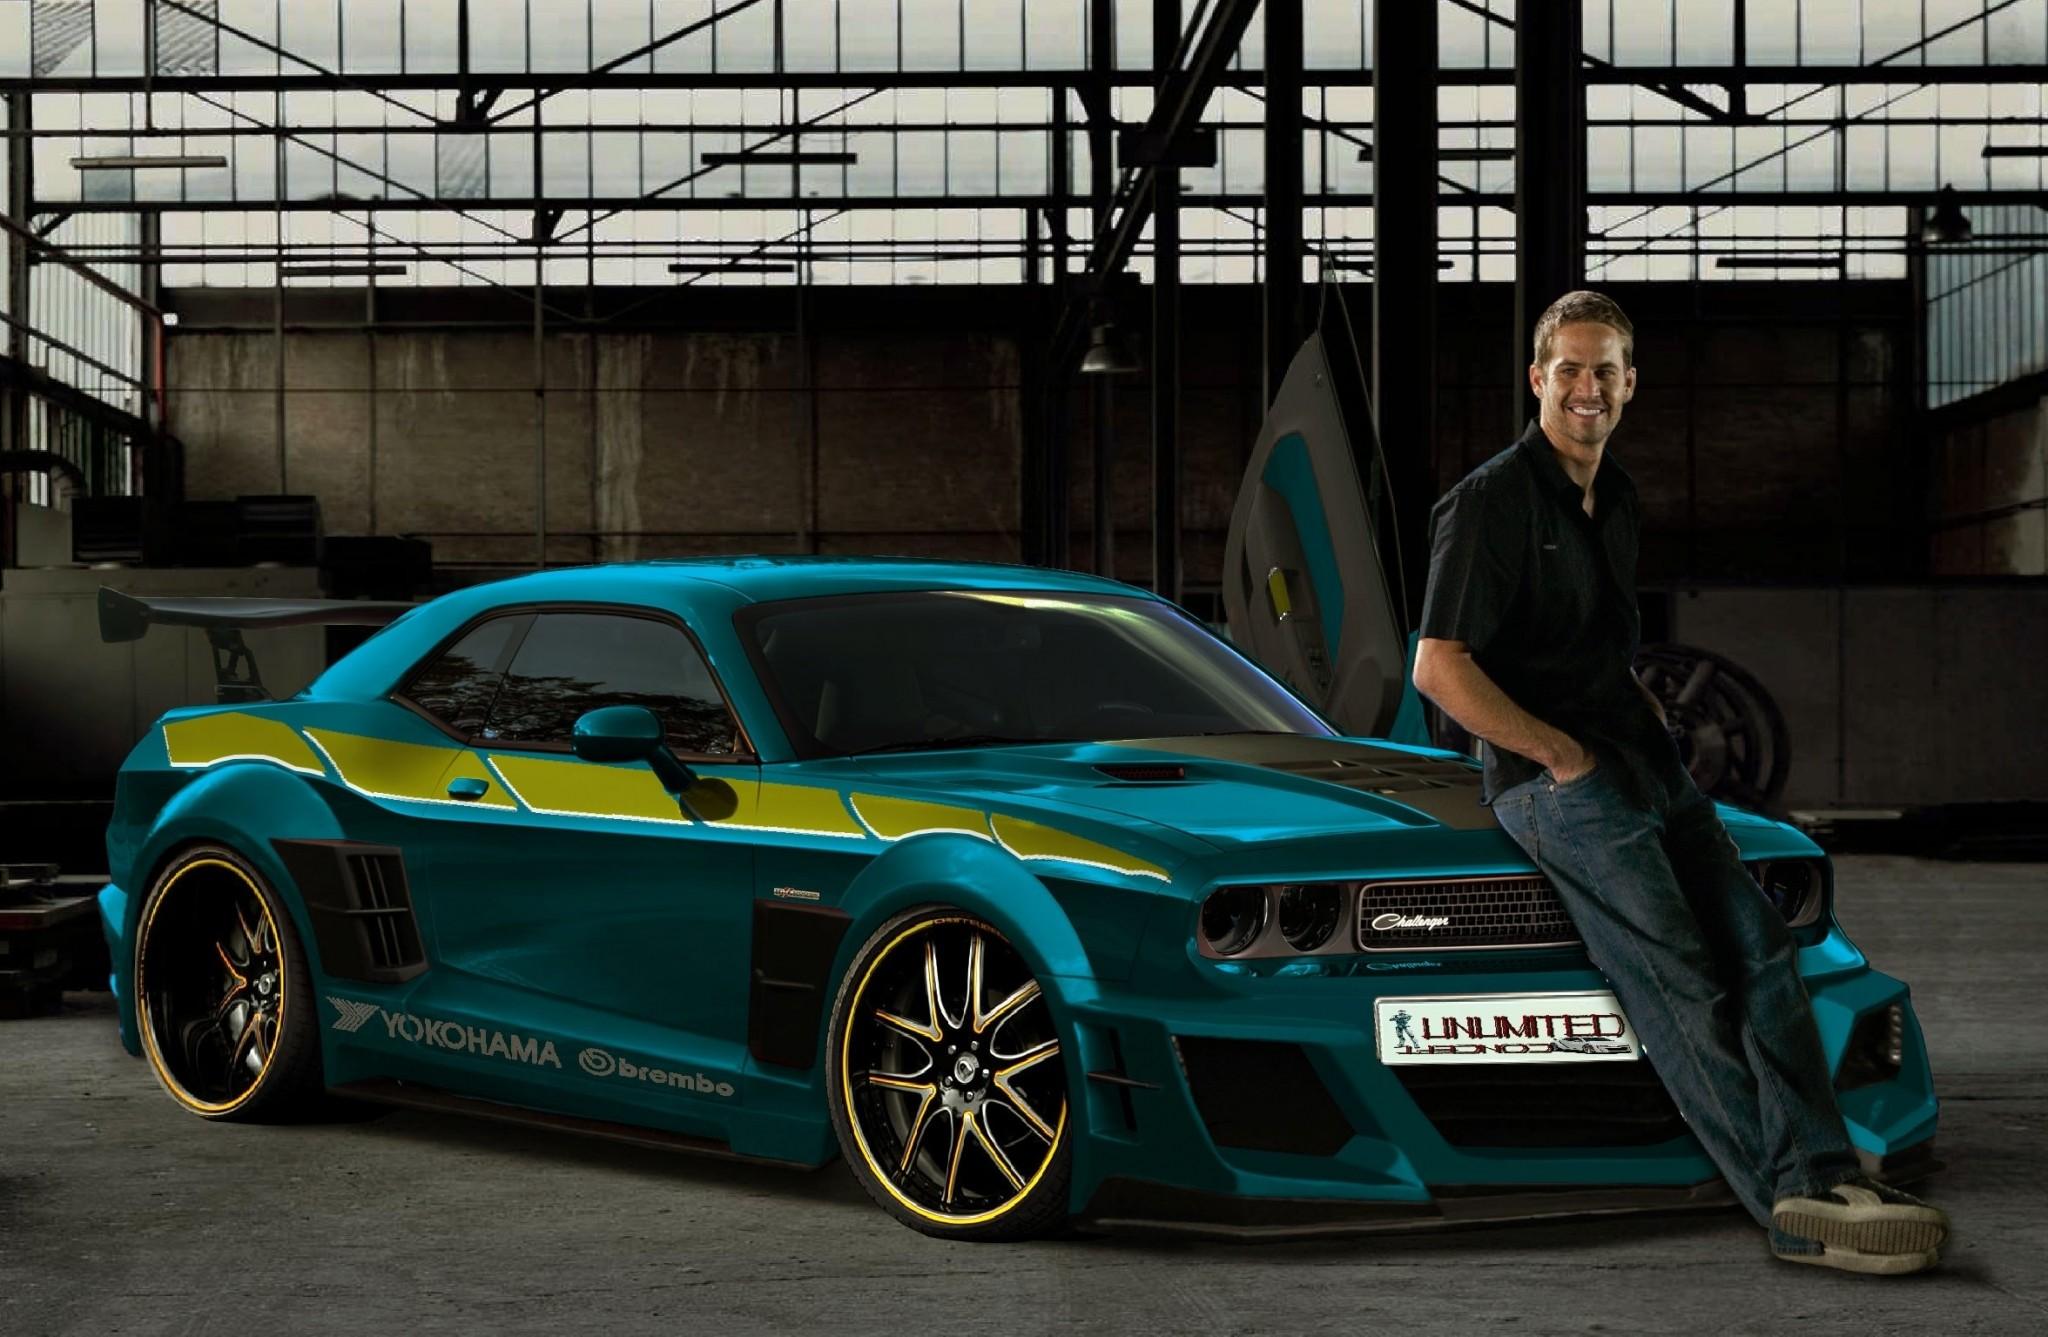 Fast And Furious 6 Cars Hd Wallpaper Paul Walker Wallpaper 183 ① Wallpapertag